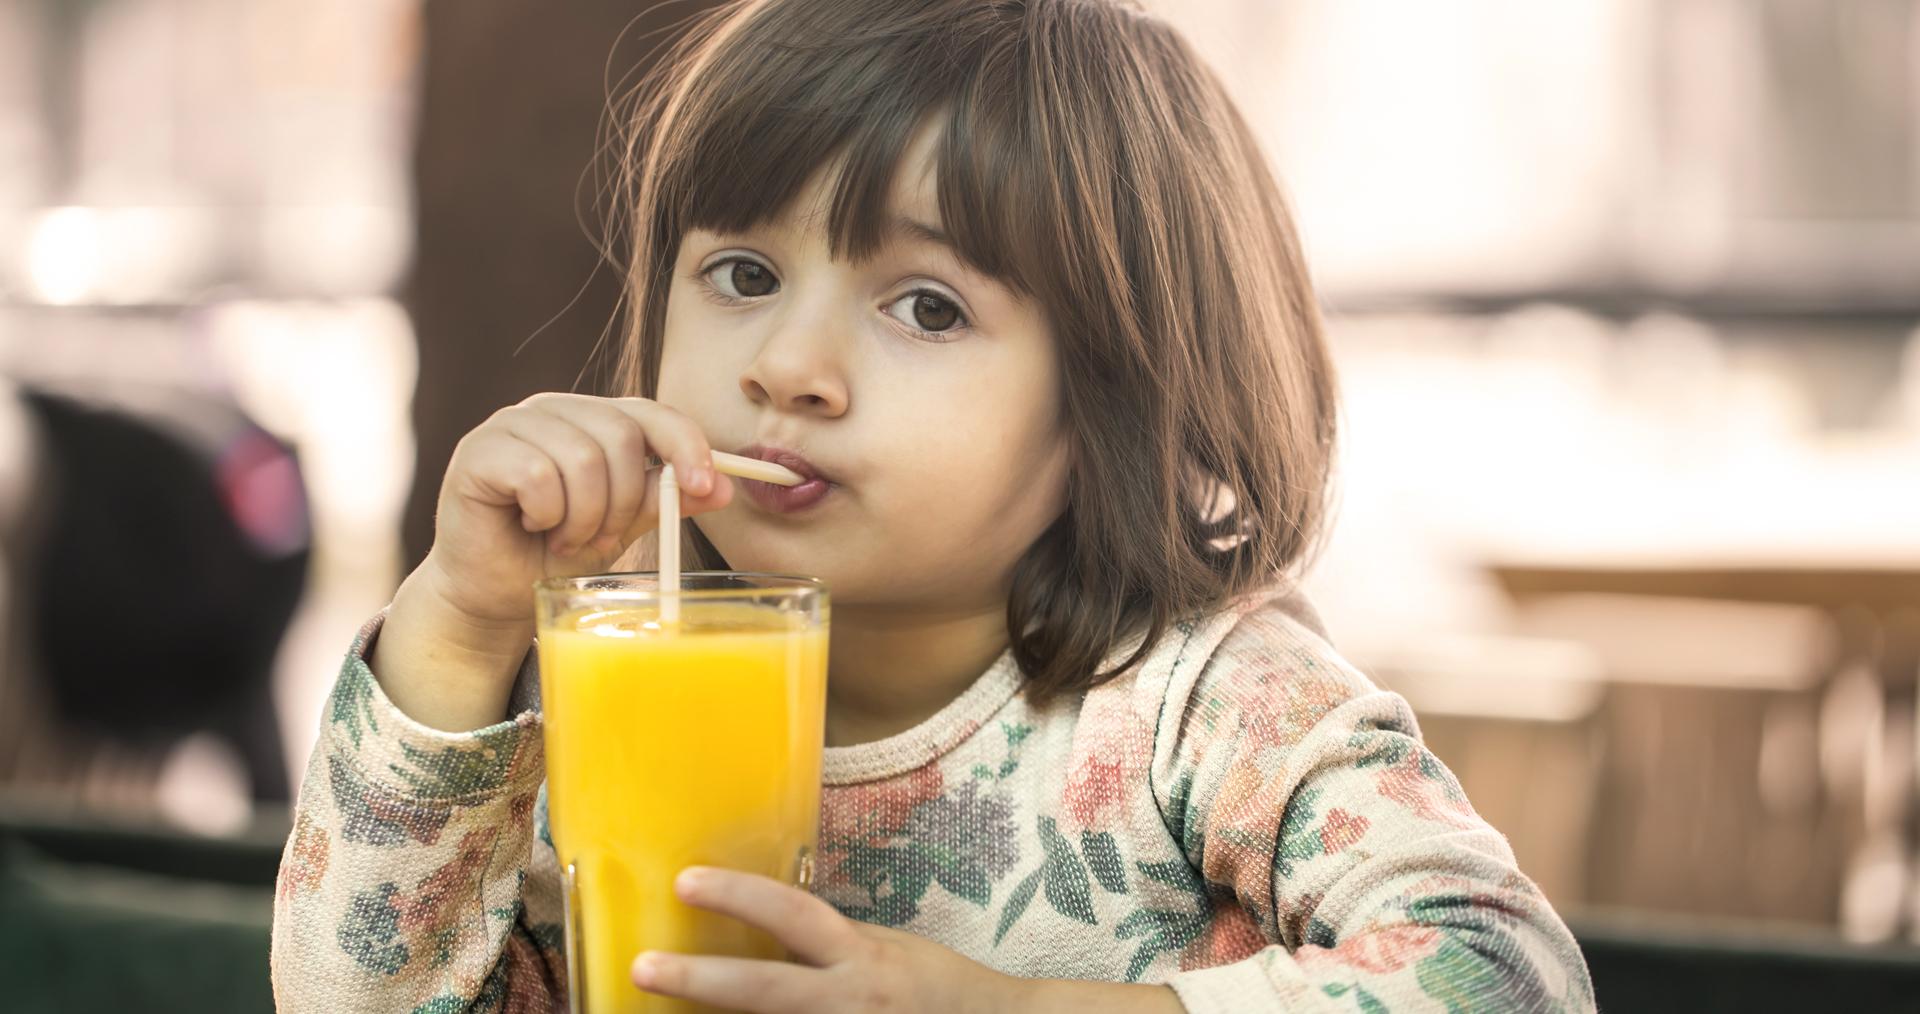 Little Cute Girl In A Cafe Is Drinking Orange Juice, Baby Food C